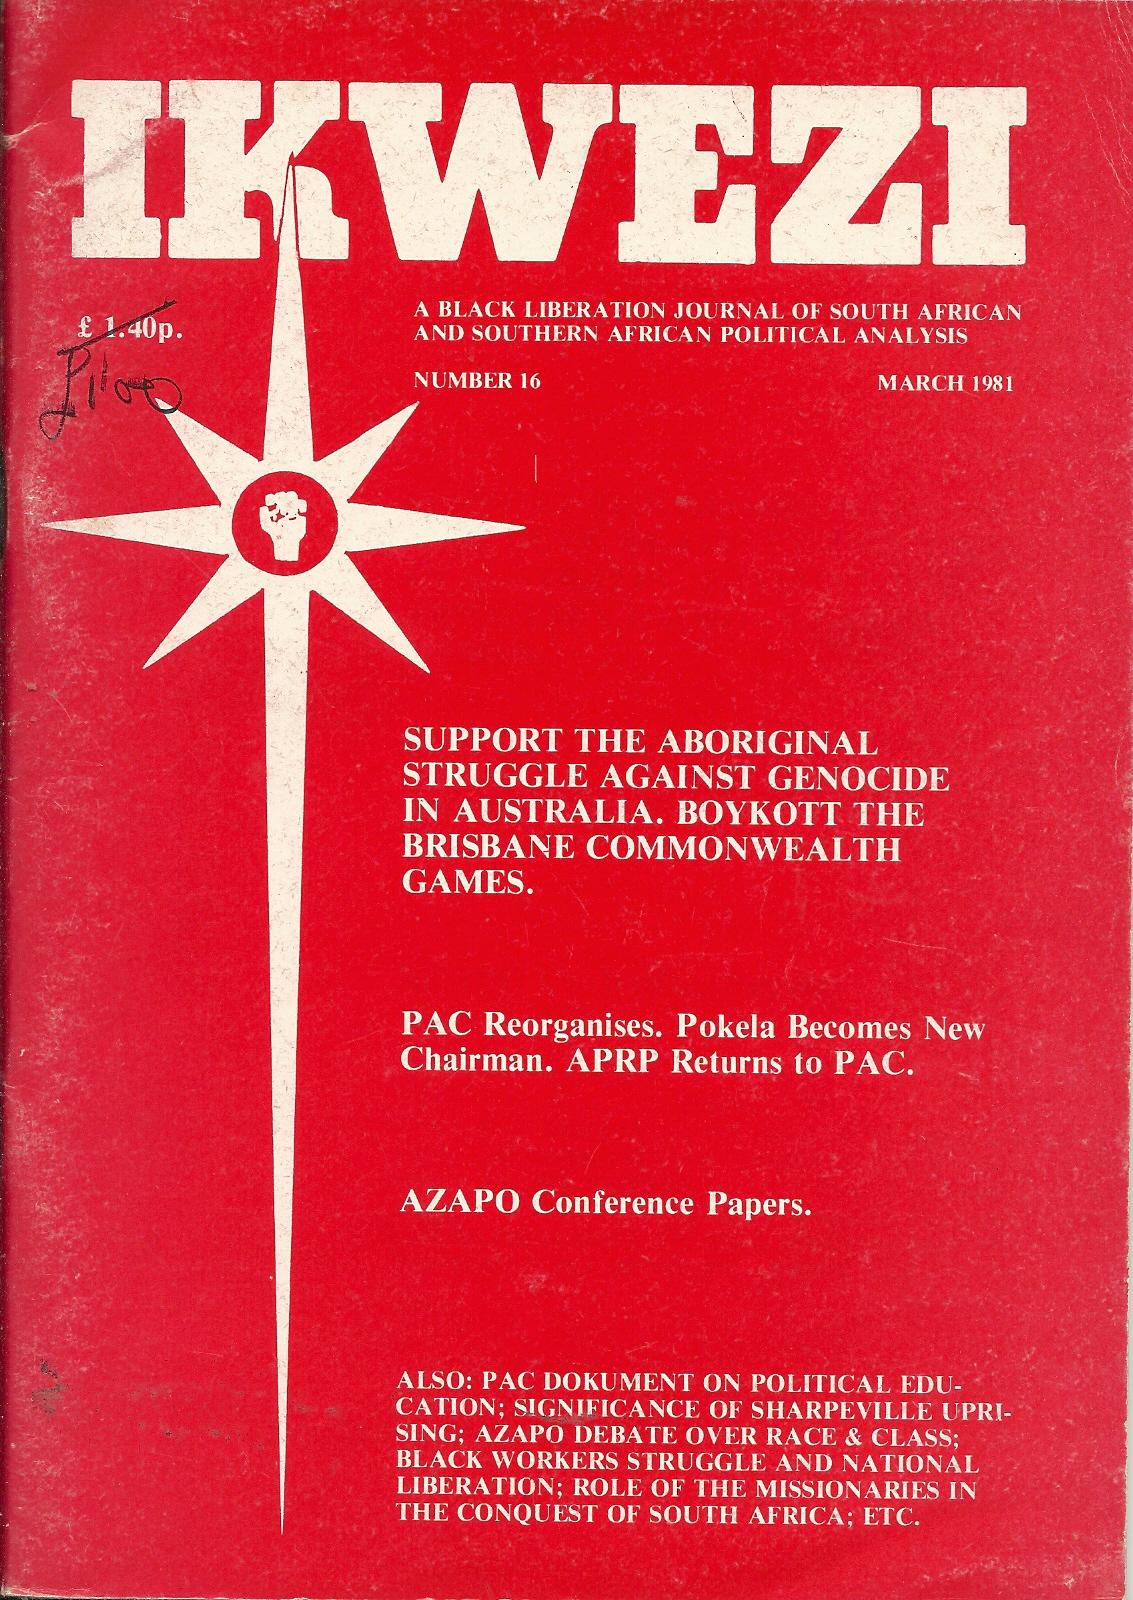 ikwezi  16 March 1981